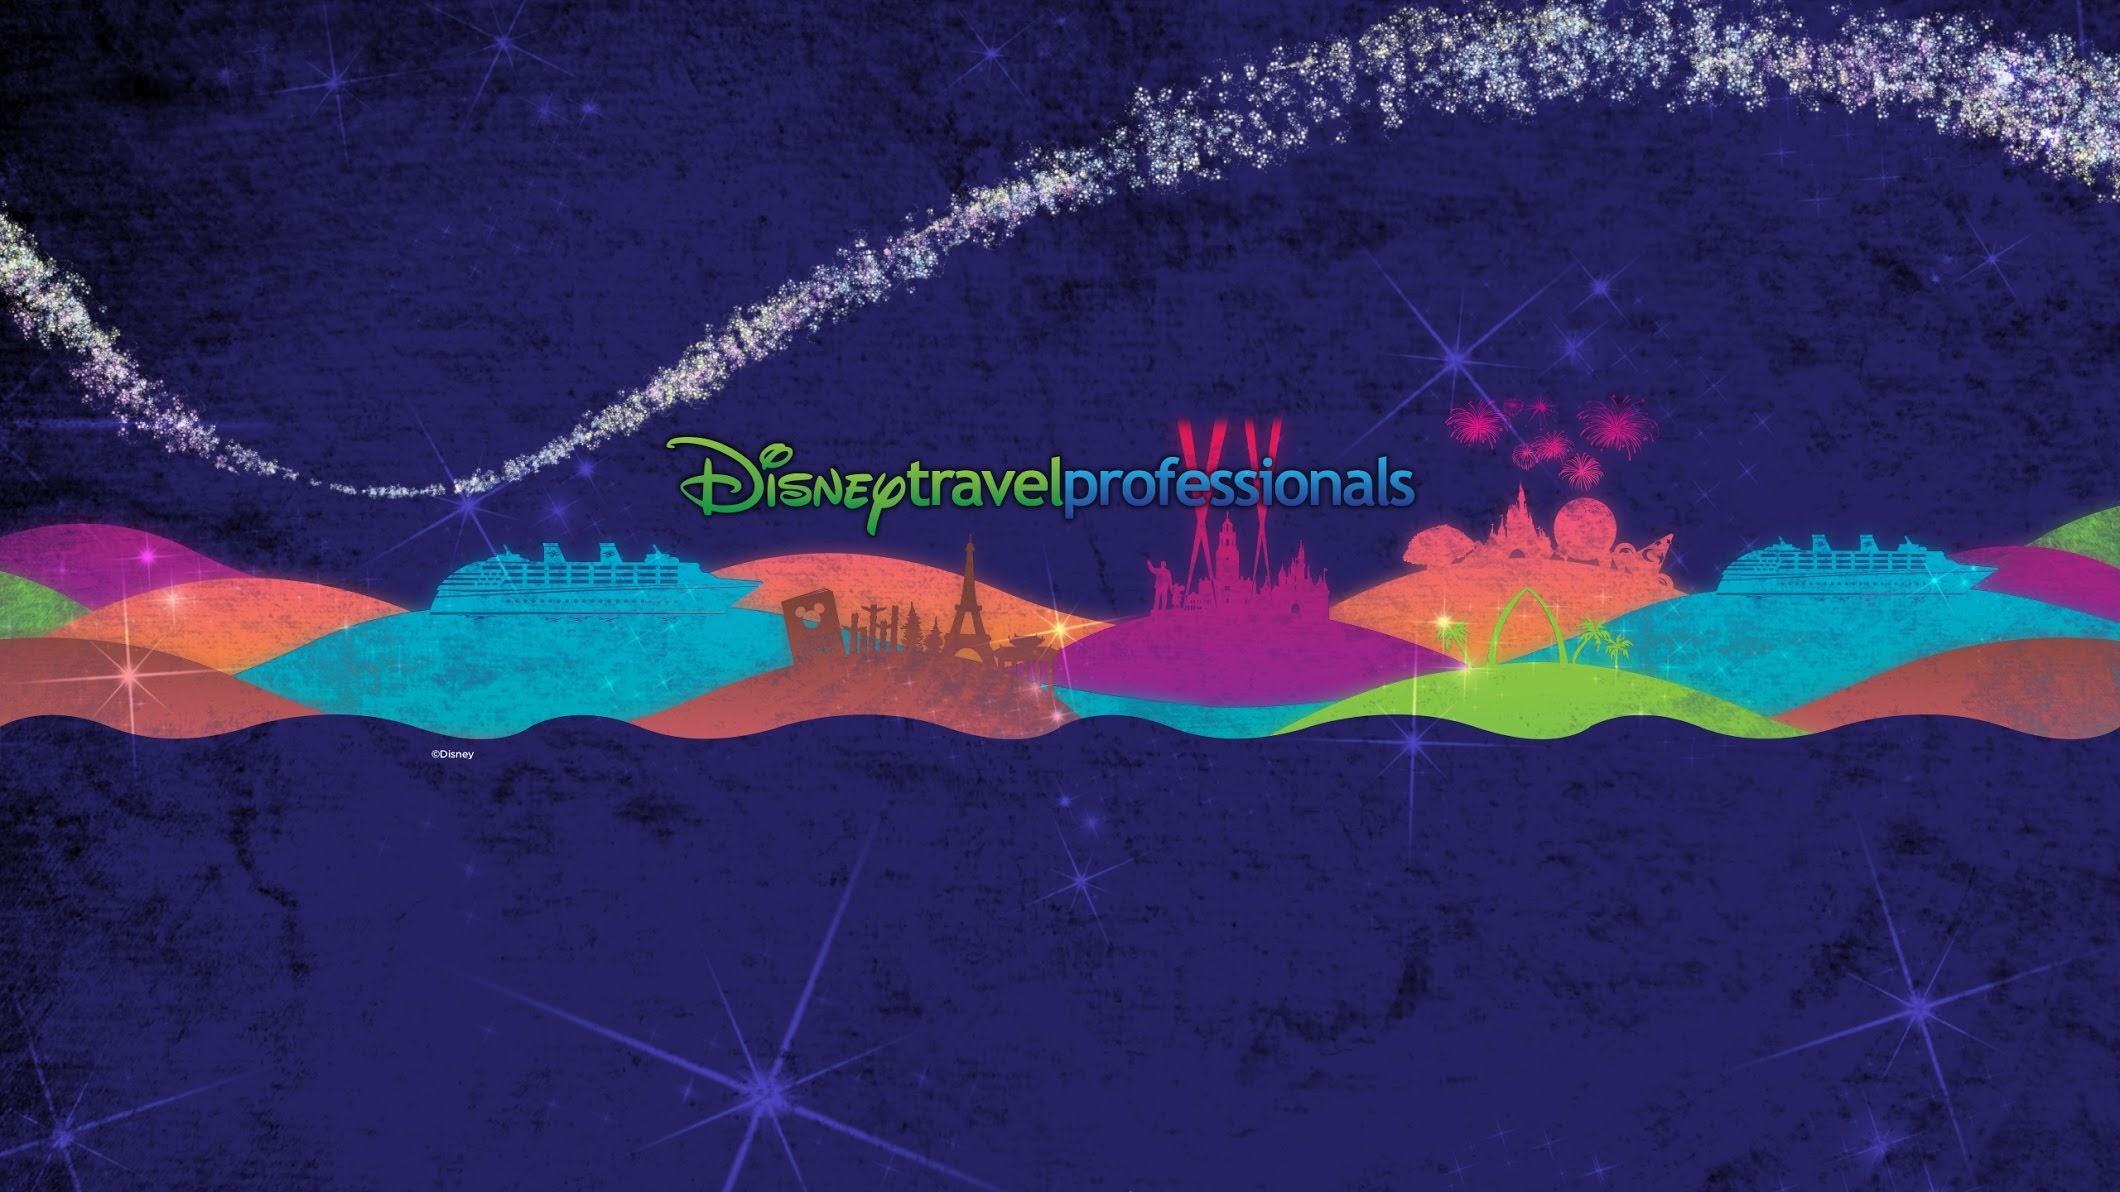 DisneyTravelPros